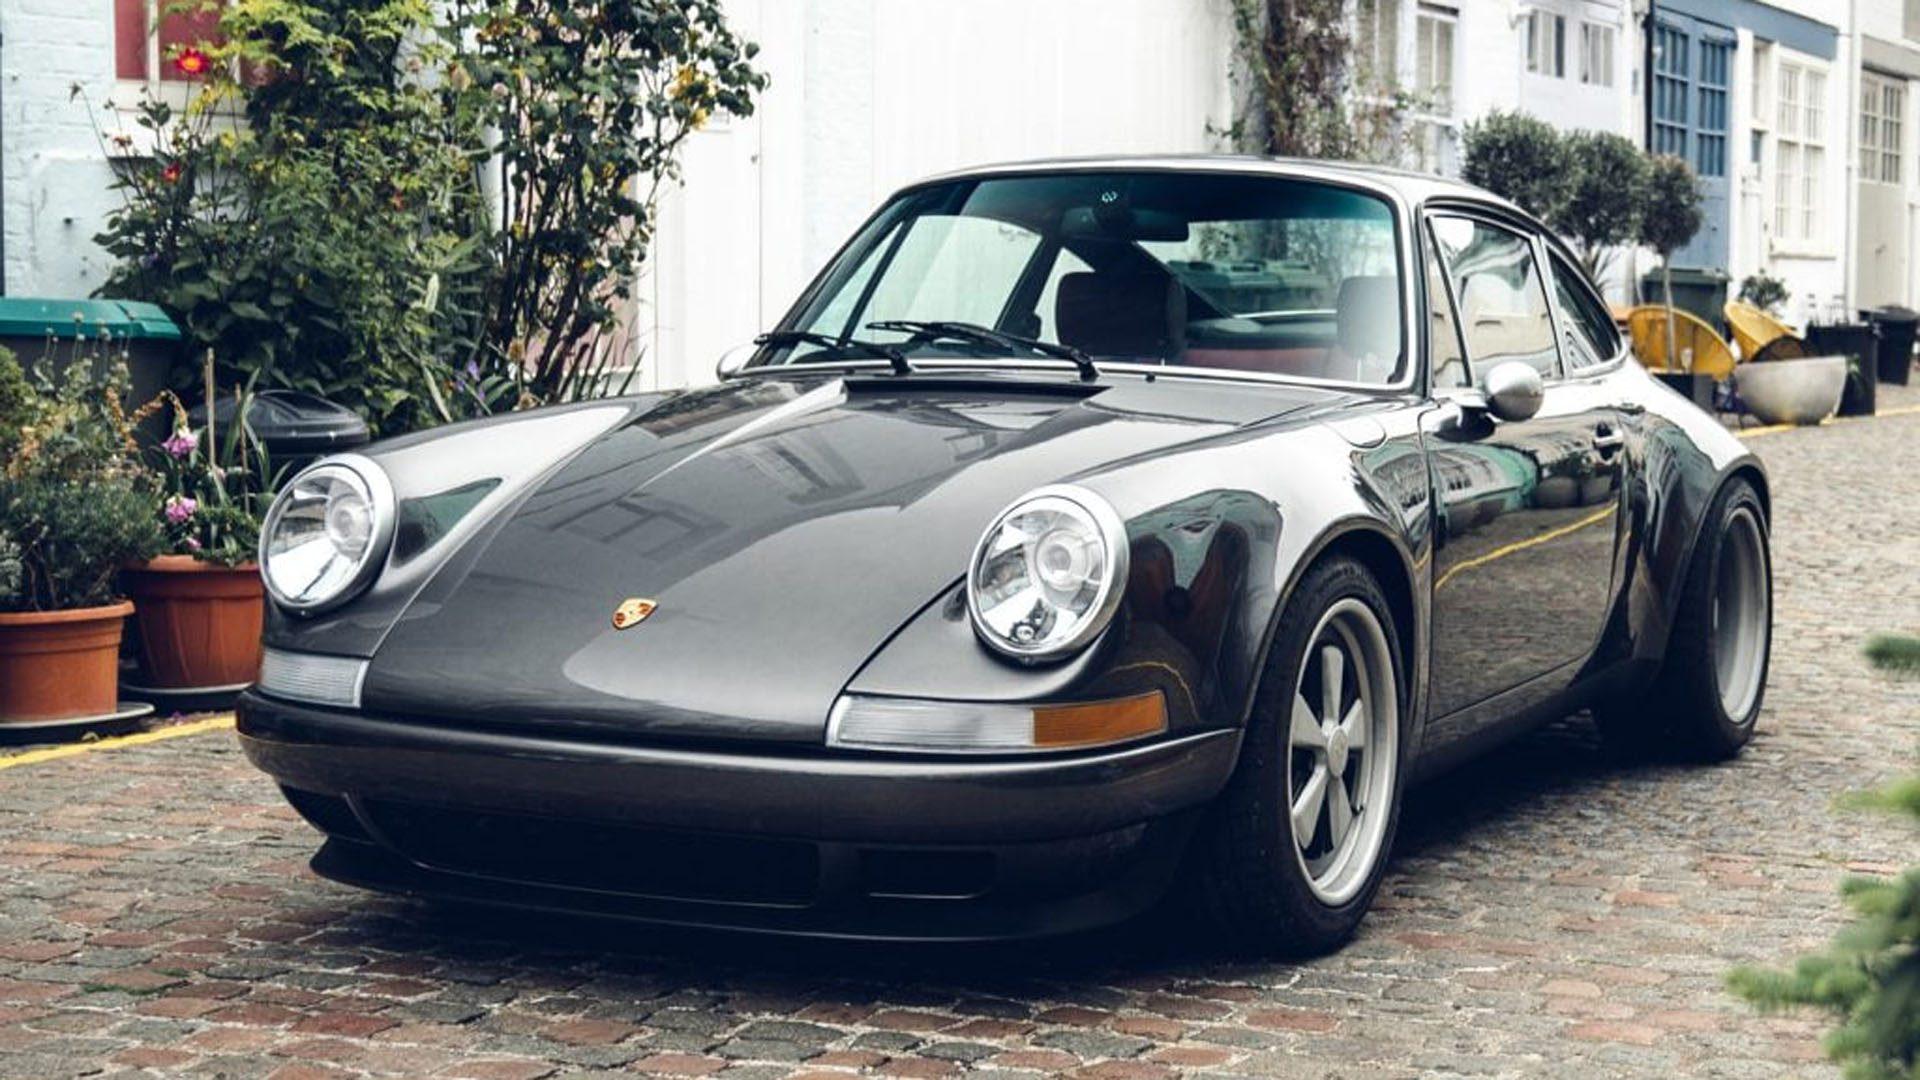 Porsche 911 by Theon Design, un espectacular restomod hecho en Reino Unido